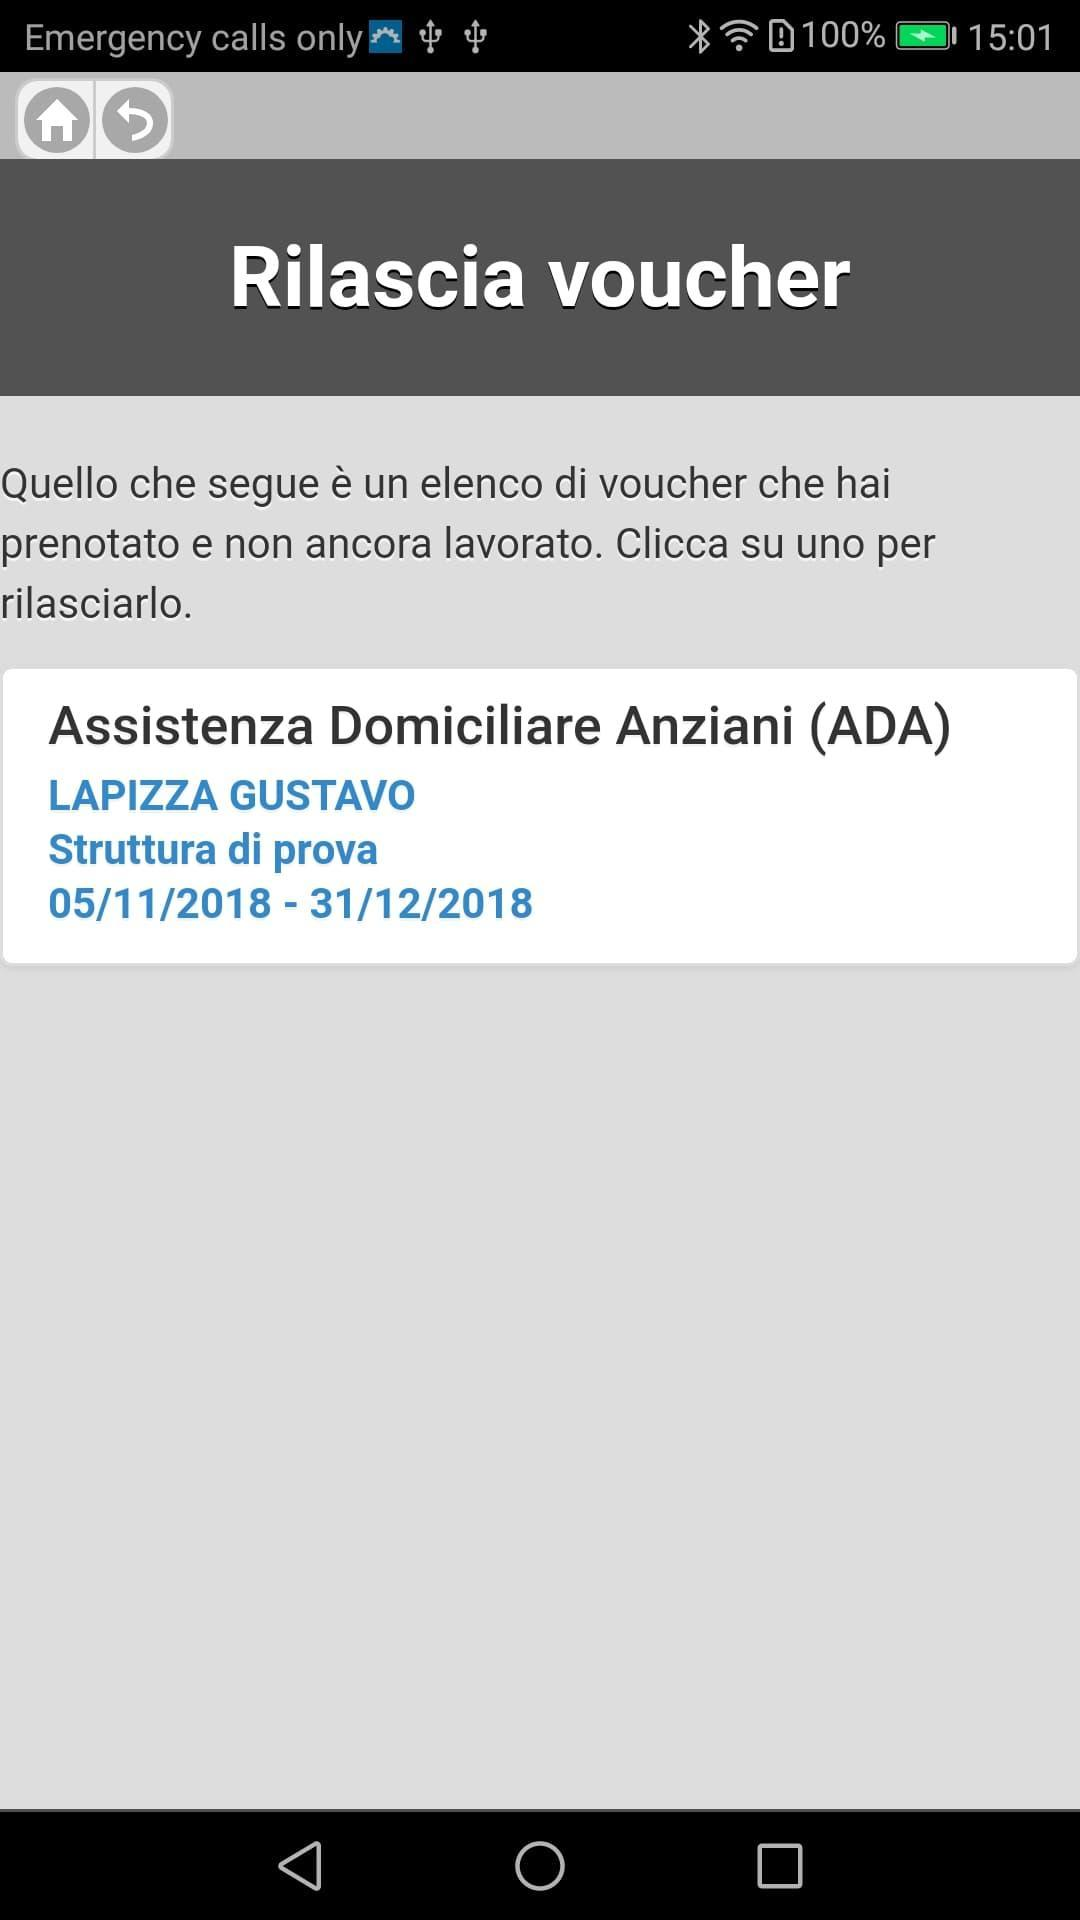 PUA Caltanissetta for Android - APK Download